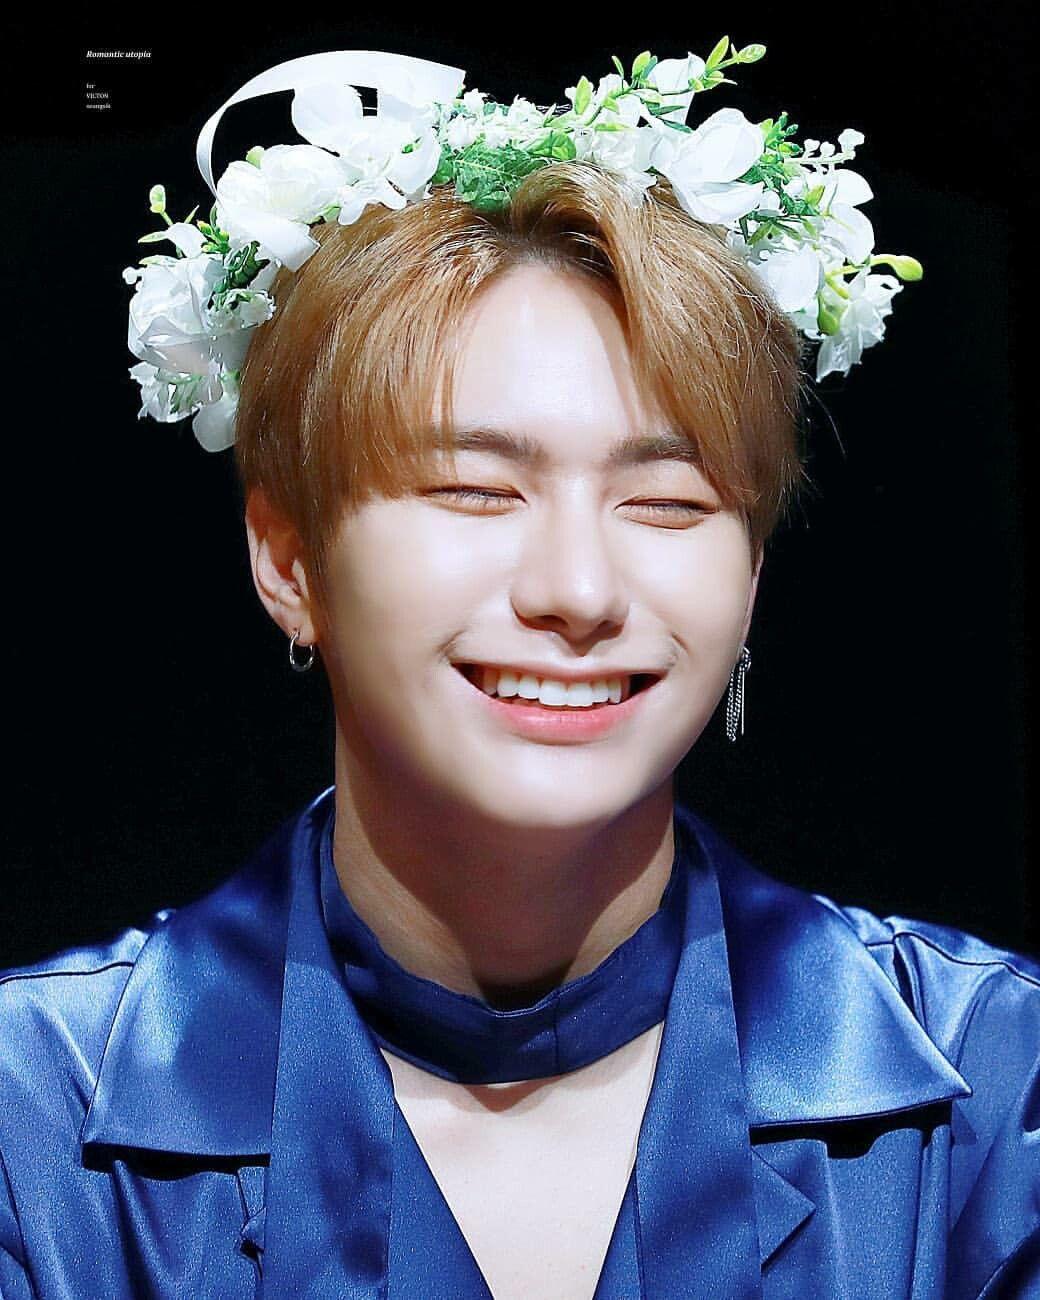 Victon Seungsik Bias Korea Idol Kpop Victon Kpop Aesthetic Flower Boys